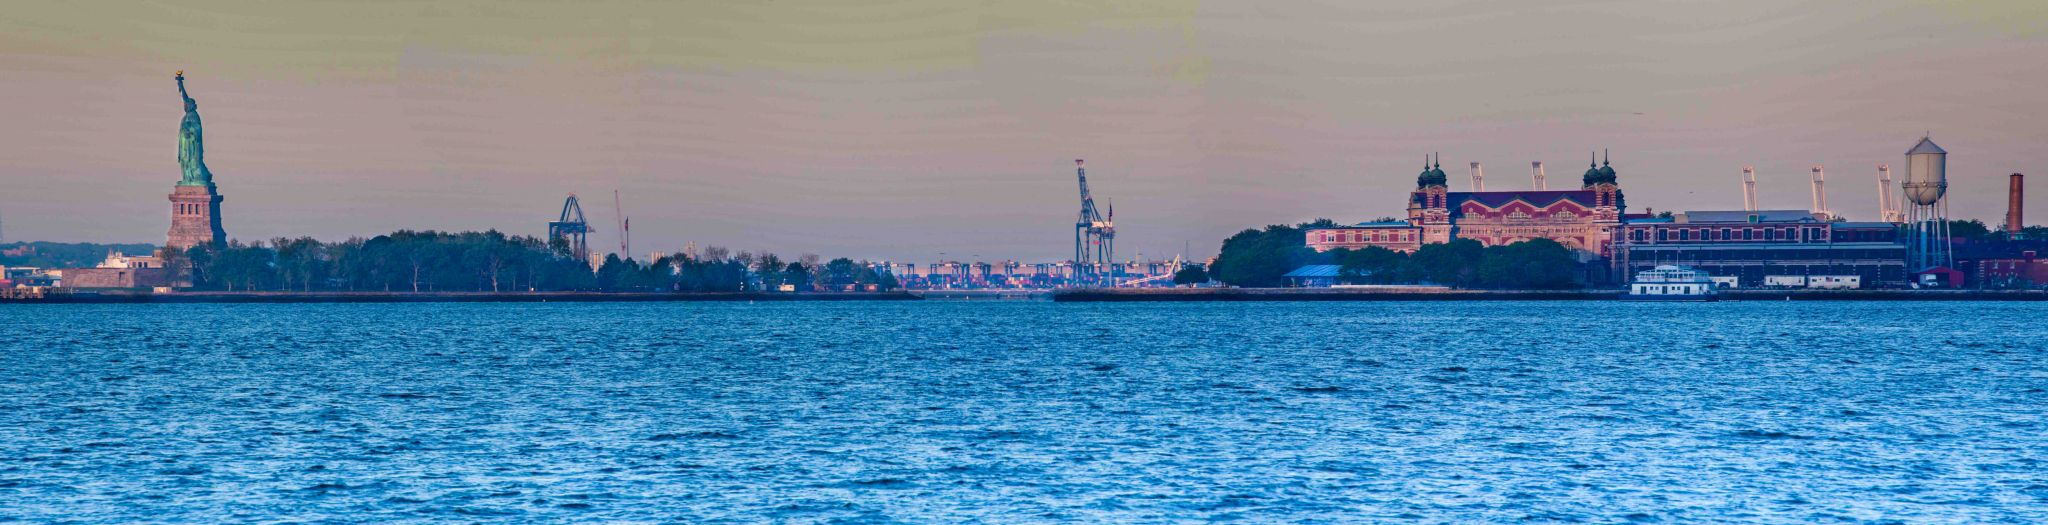 Ellis Island & Statue of Liberty Pano New York, USA